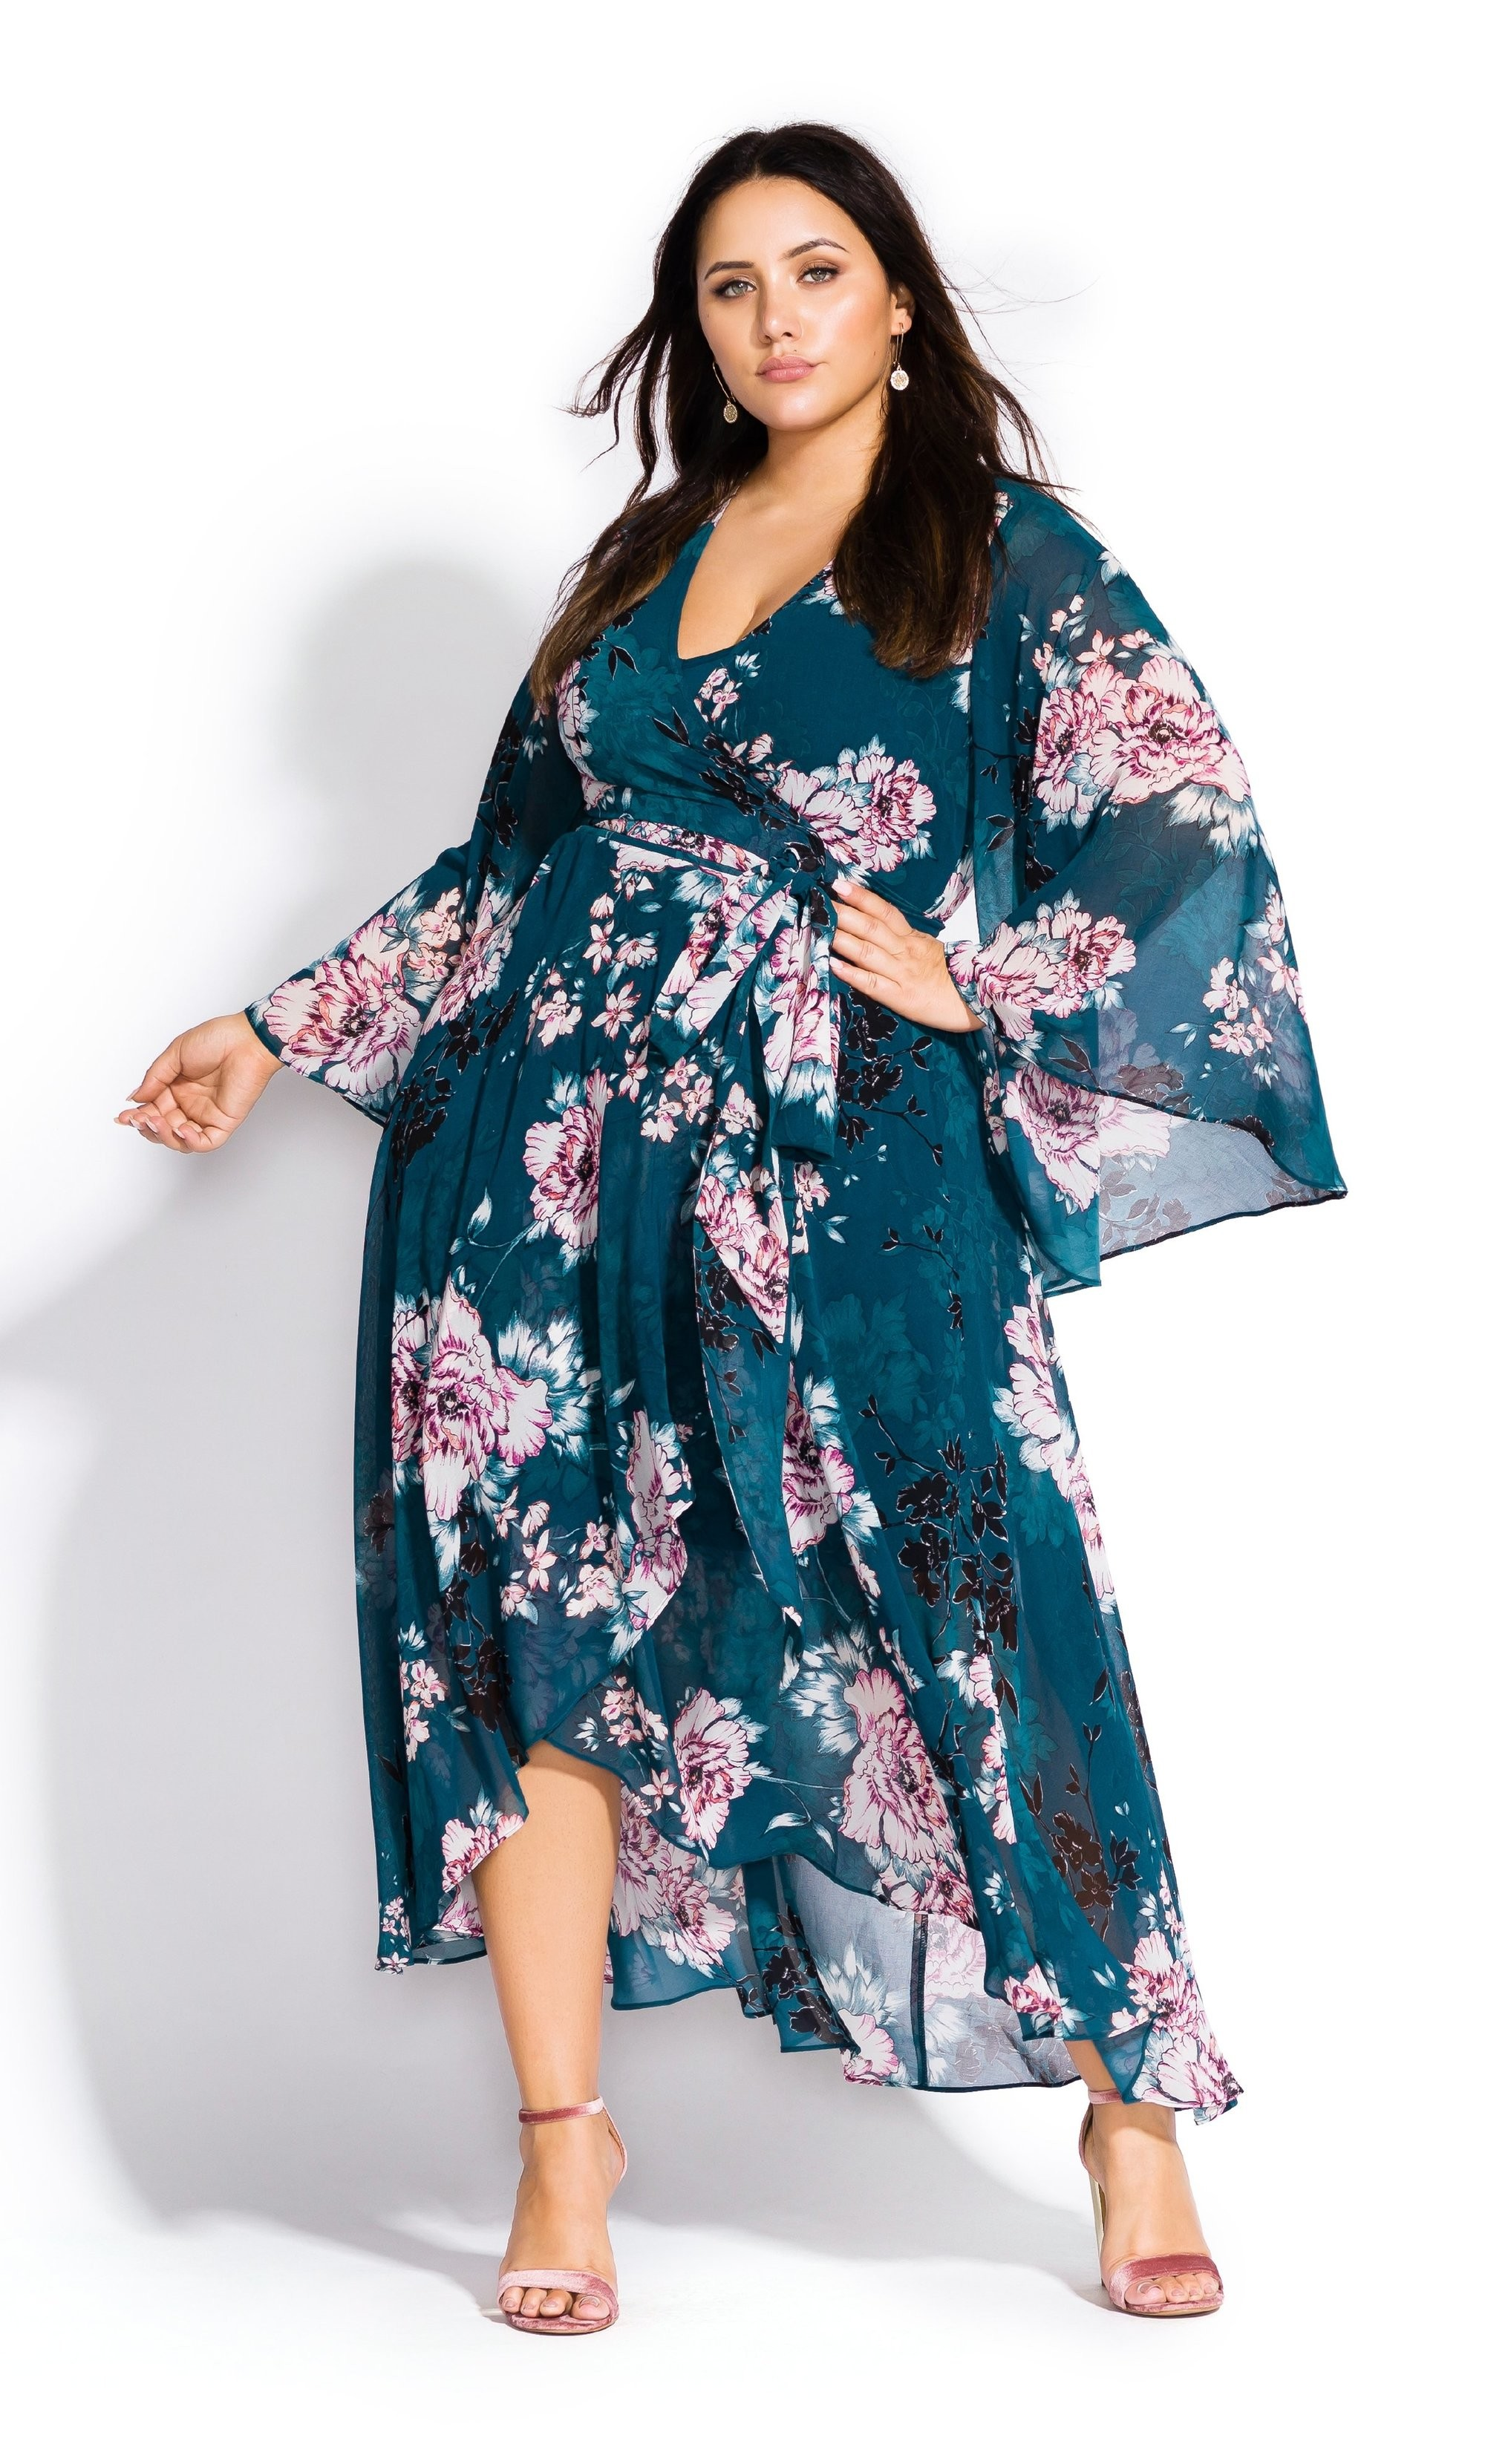 City Chic Womens Apparel Womens Short Sleeve Knee Length Waist Detailed Printed Dress Dress